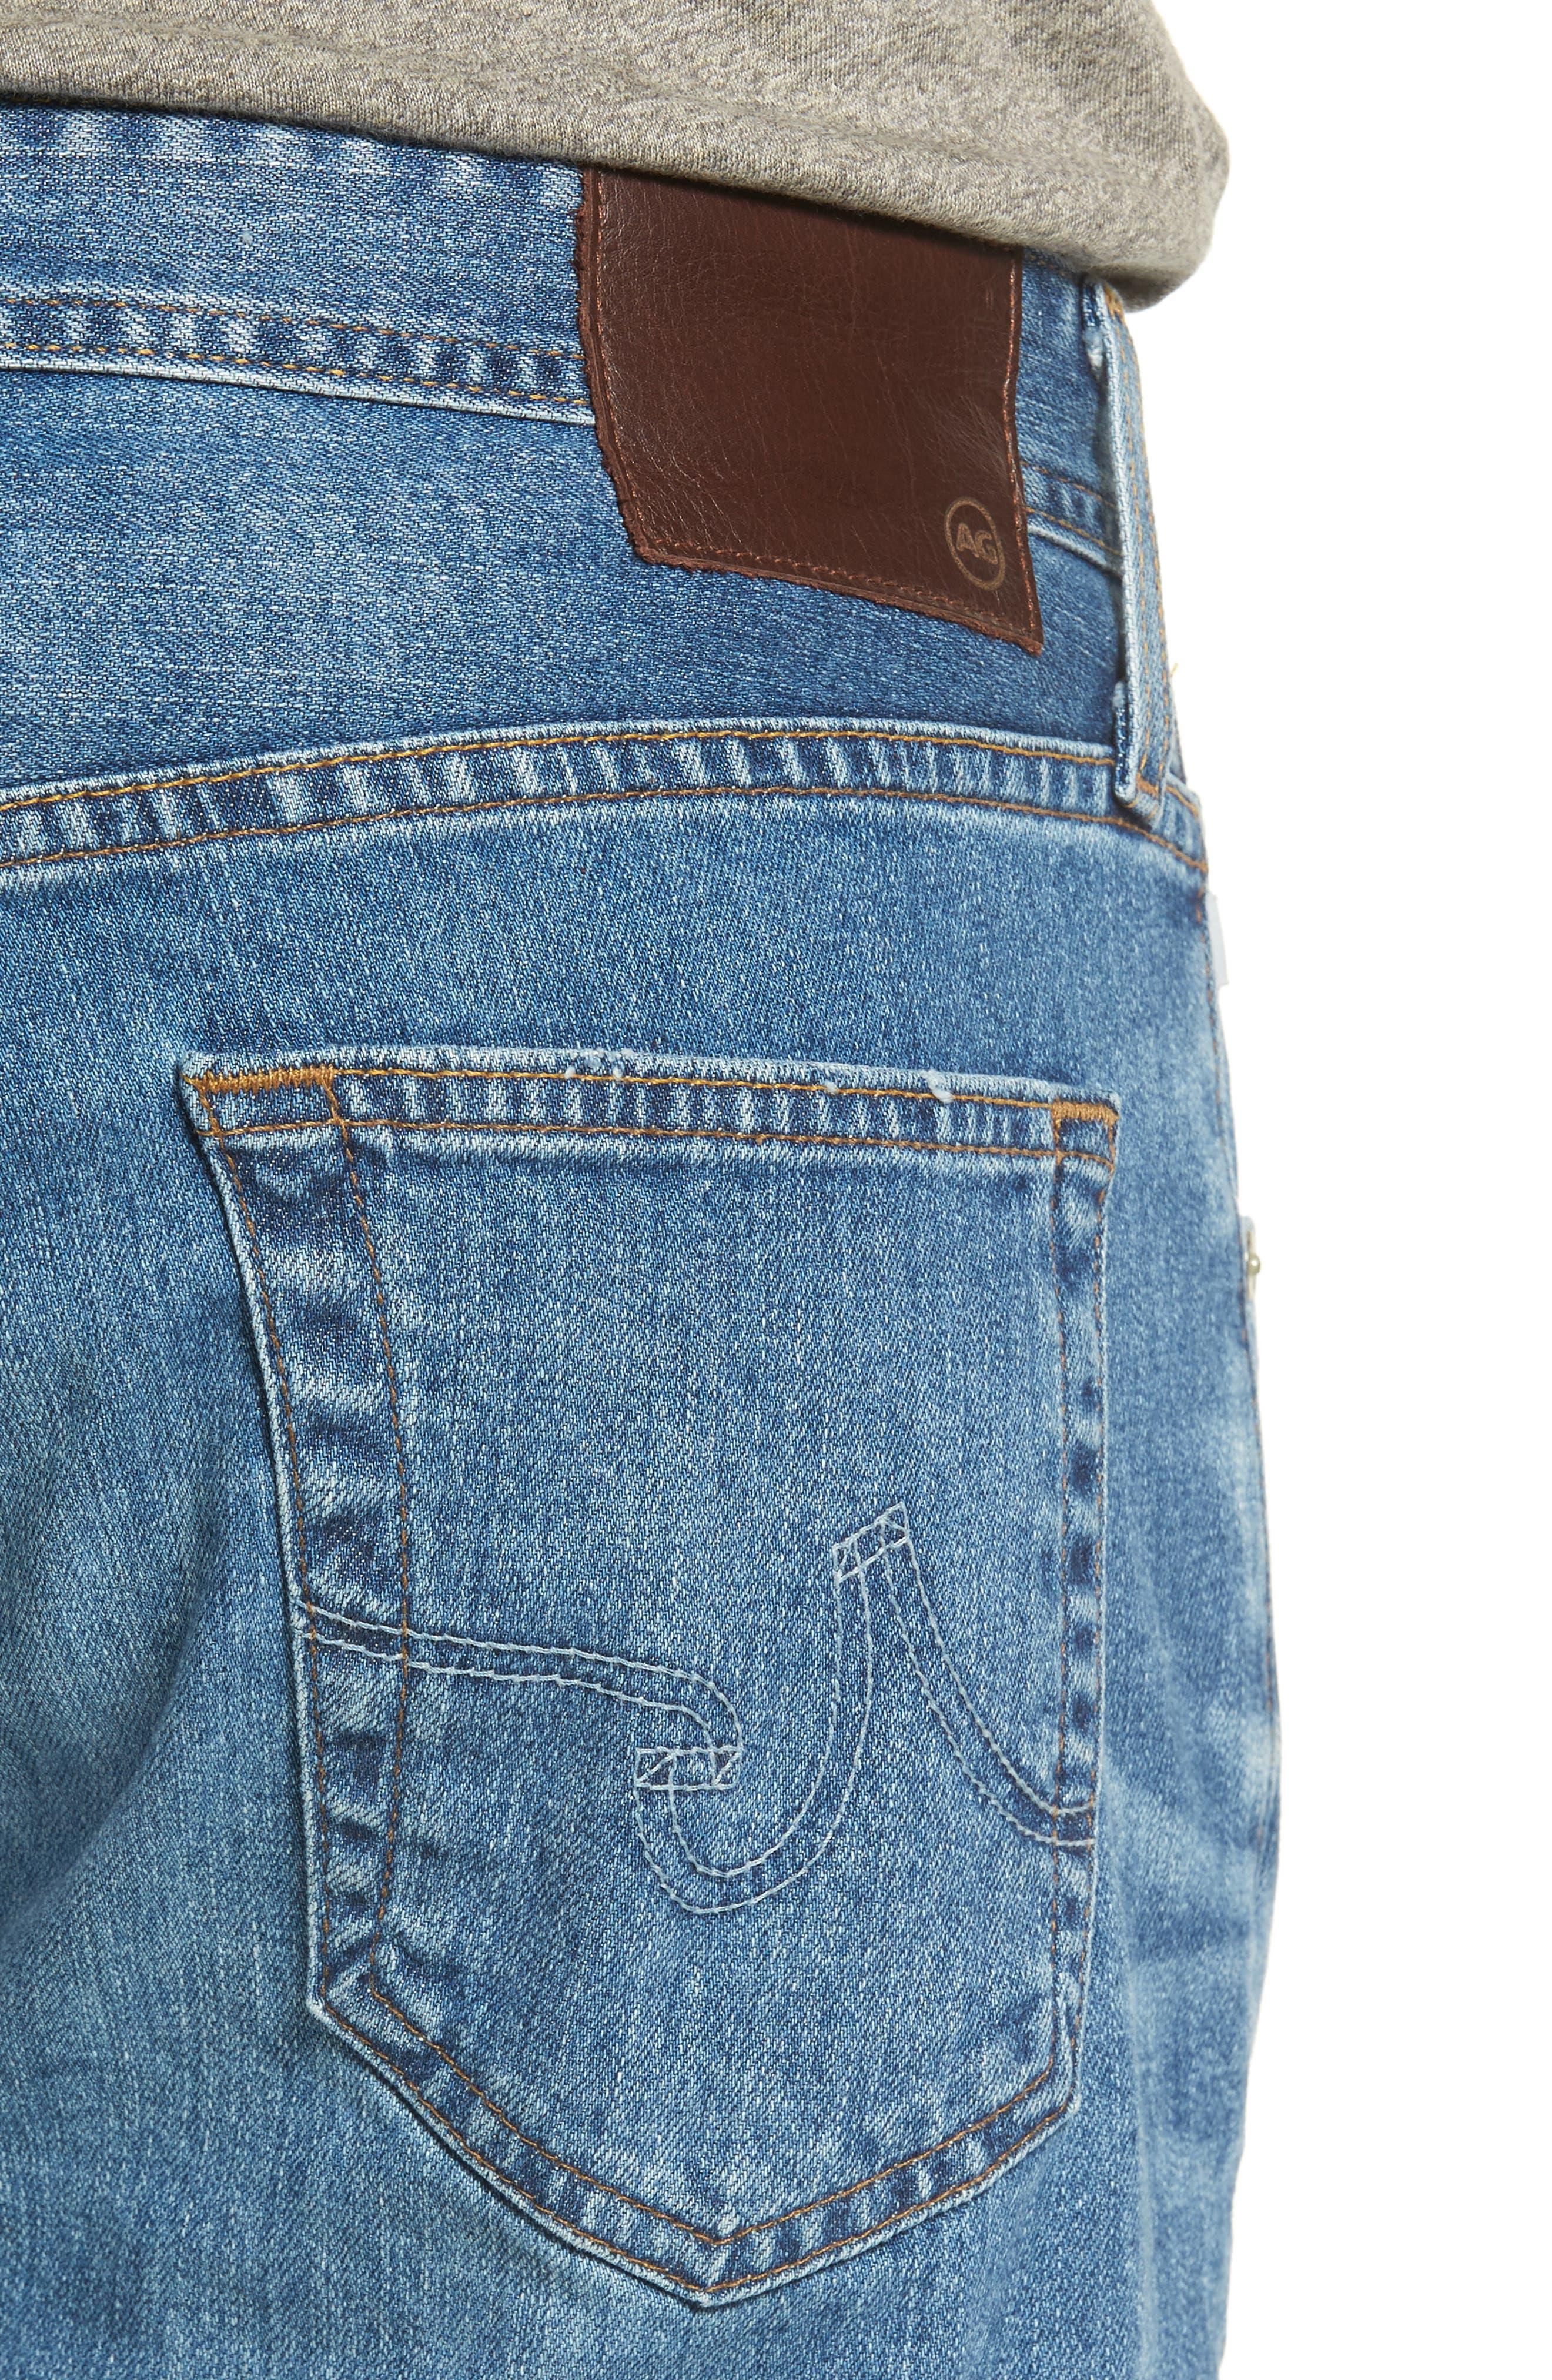 Ives Straight Leg Jeans,                             Alternate thumbnail 4, color,                             16 Years Broken Ground